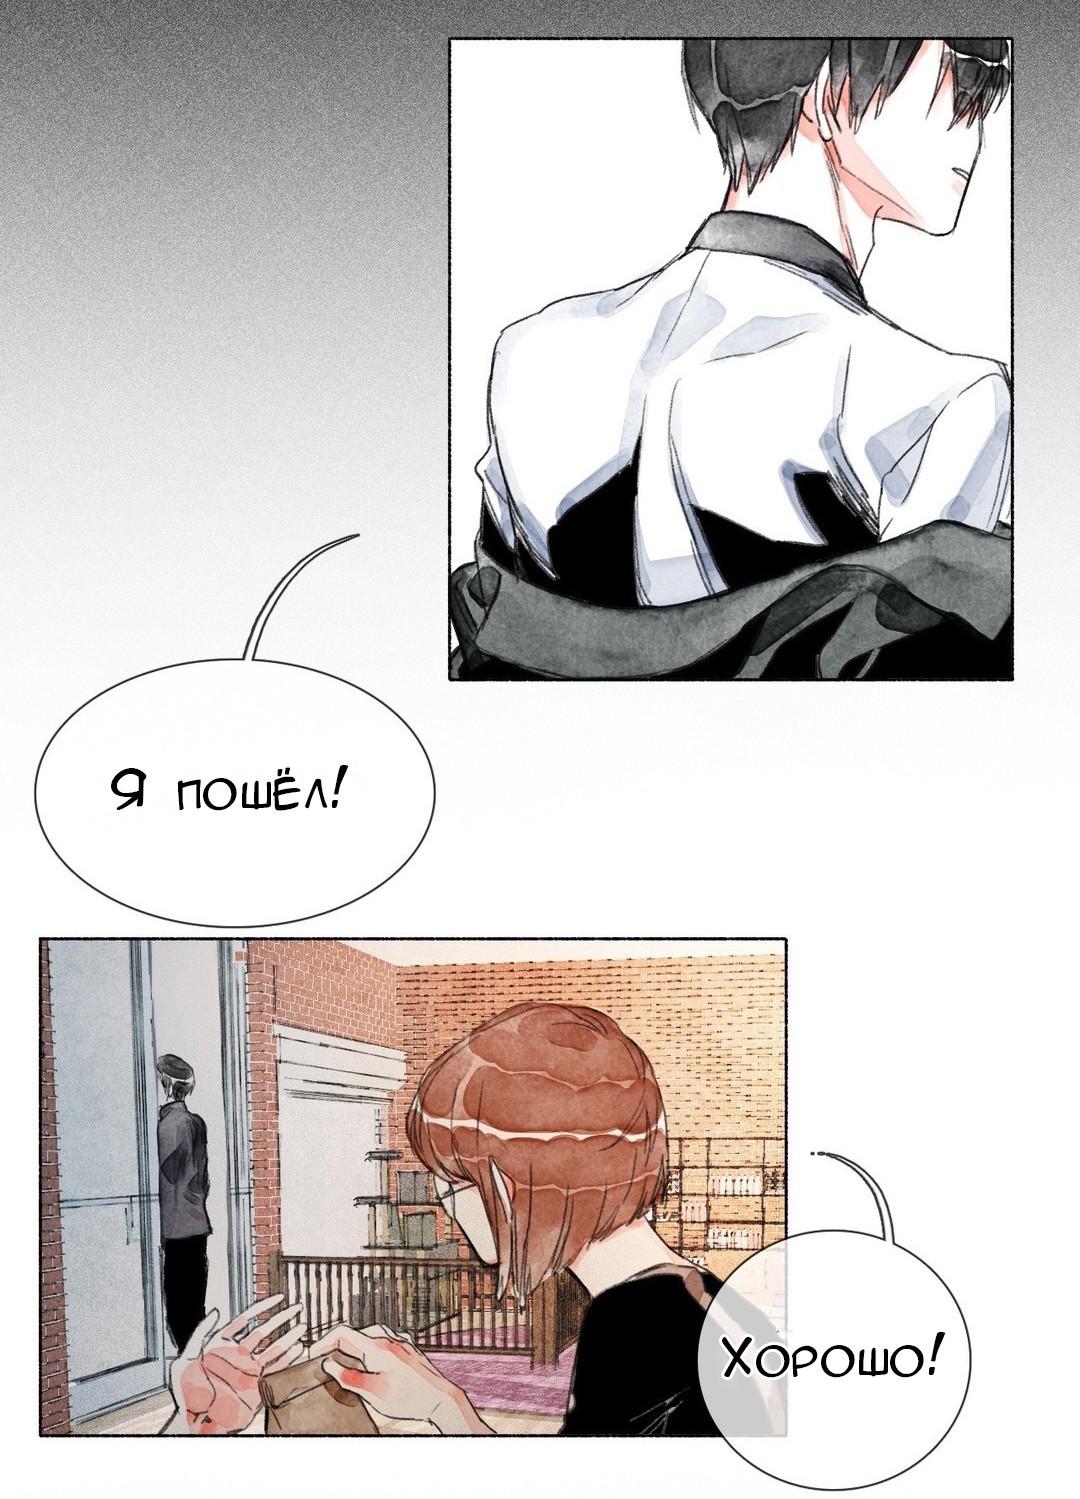 https://r2.ninemanga.com/comics/pic4/36/37860/1339494/1557622960439.jpg Page 11